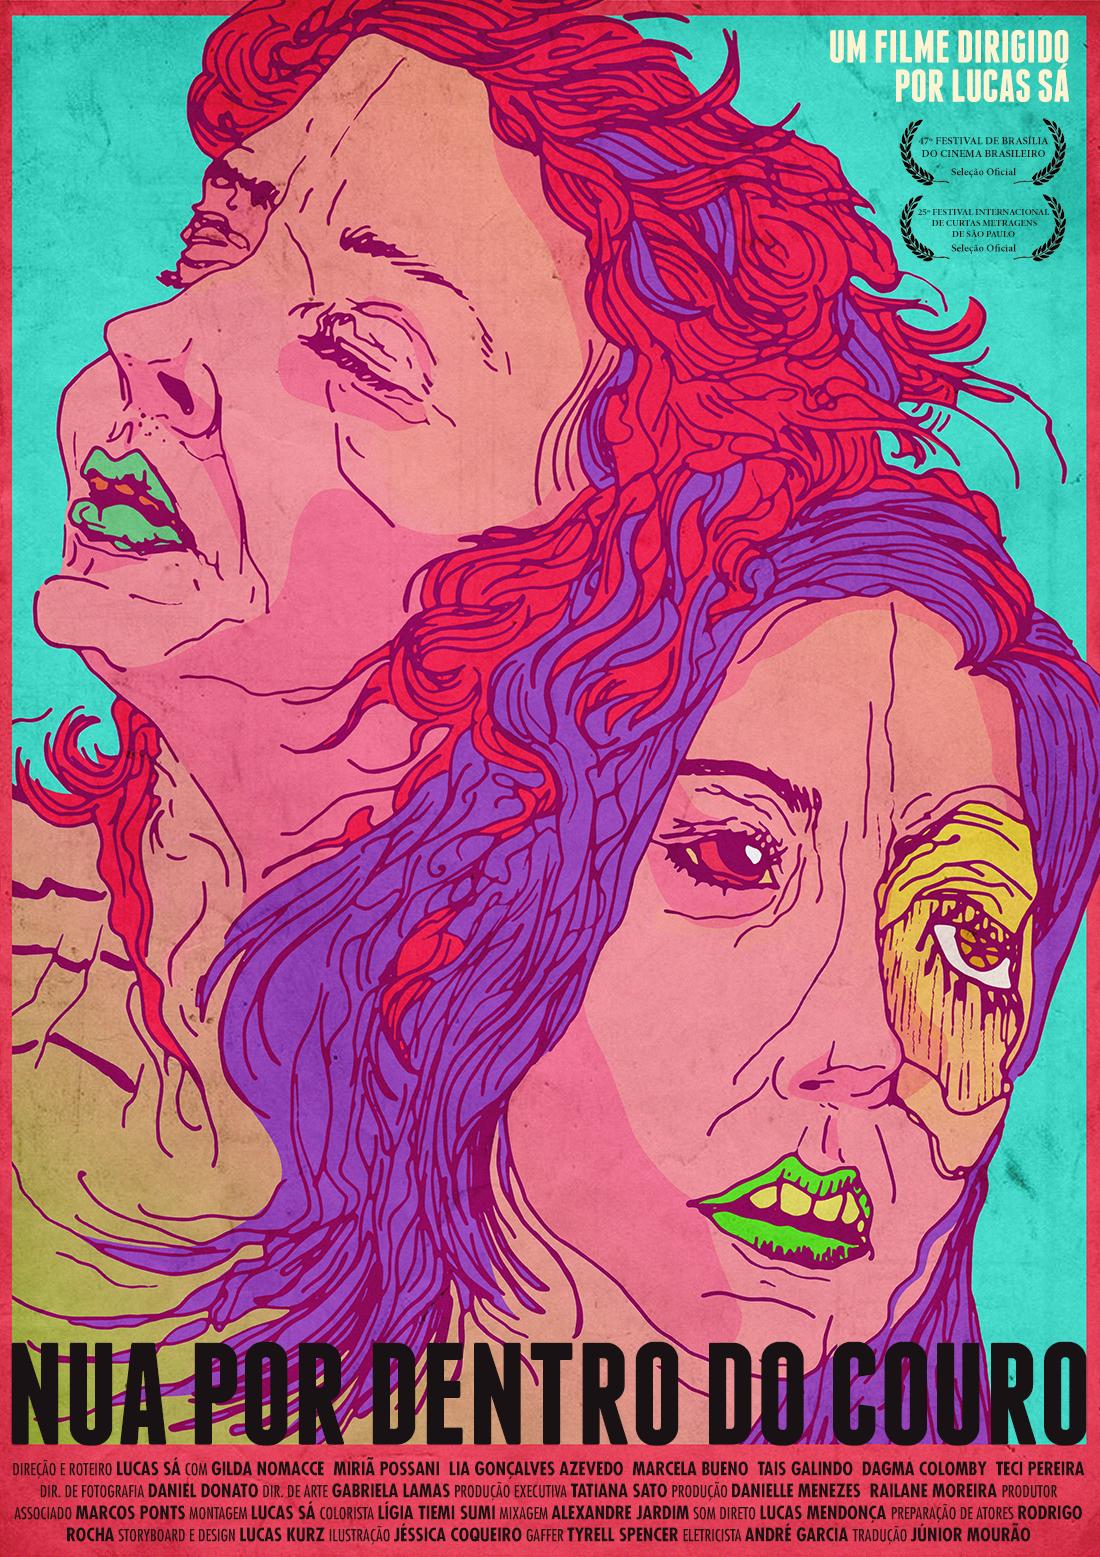 Nua por Dentro do Couro poster.png